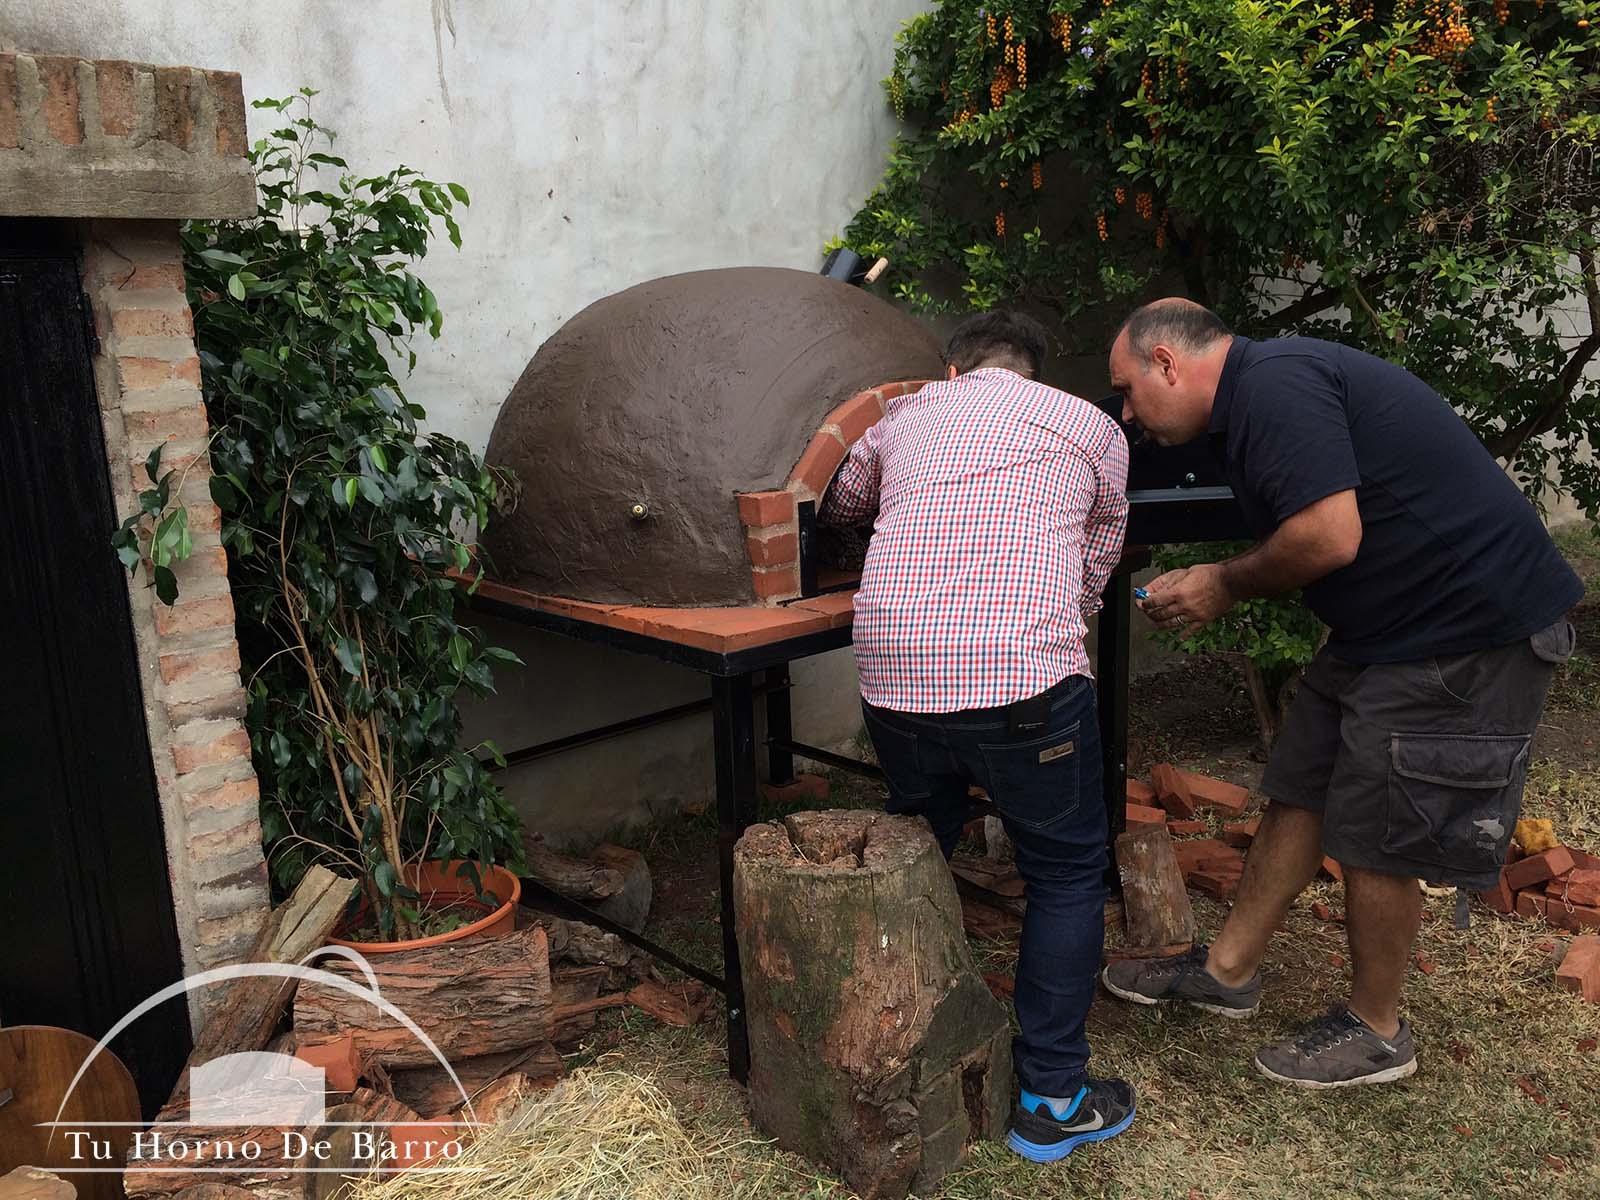 Tu Horno de Barro - Prensa 014